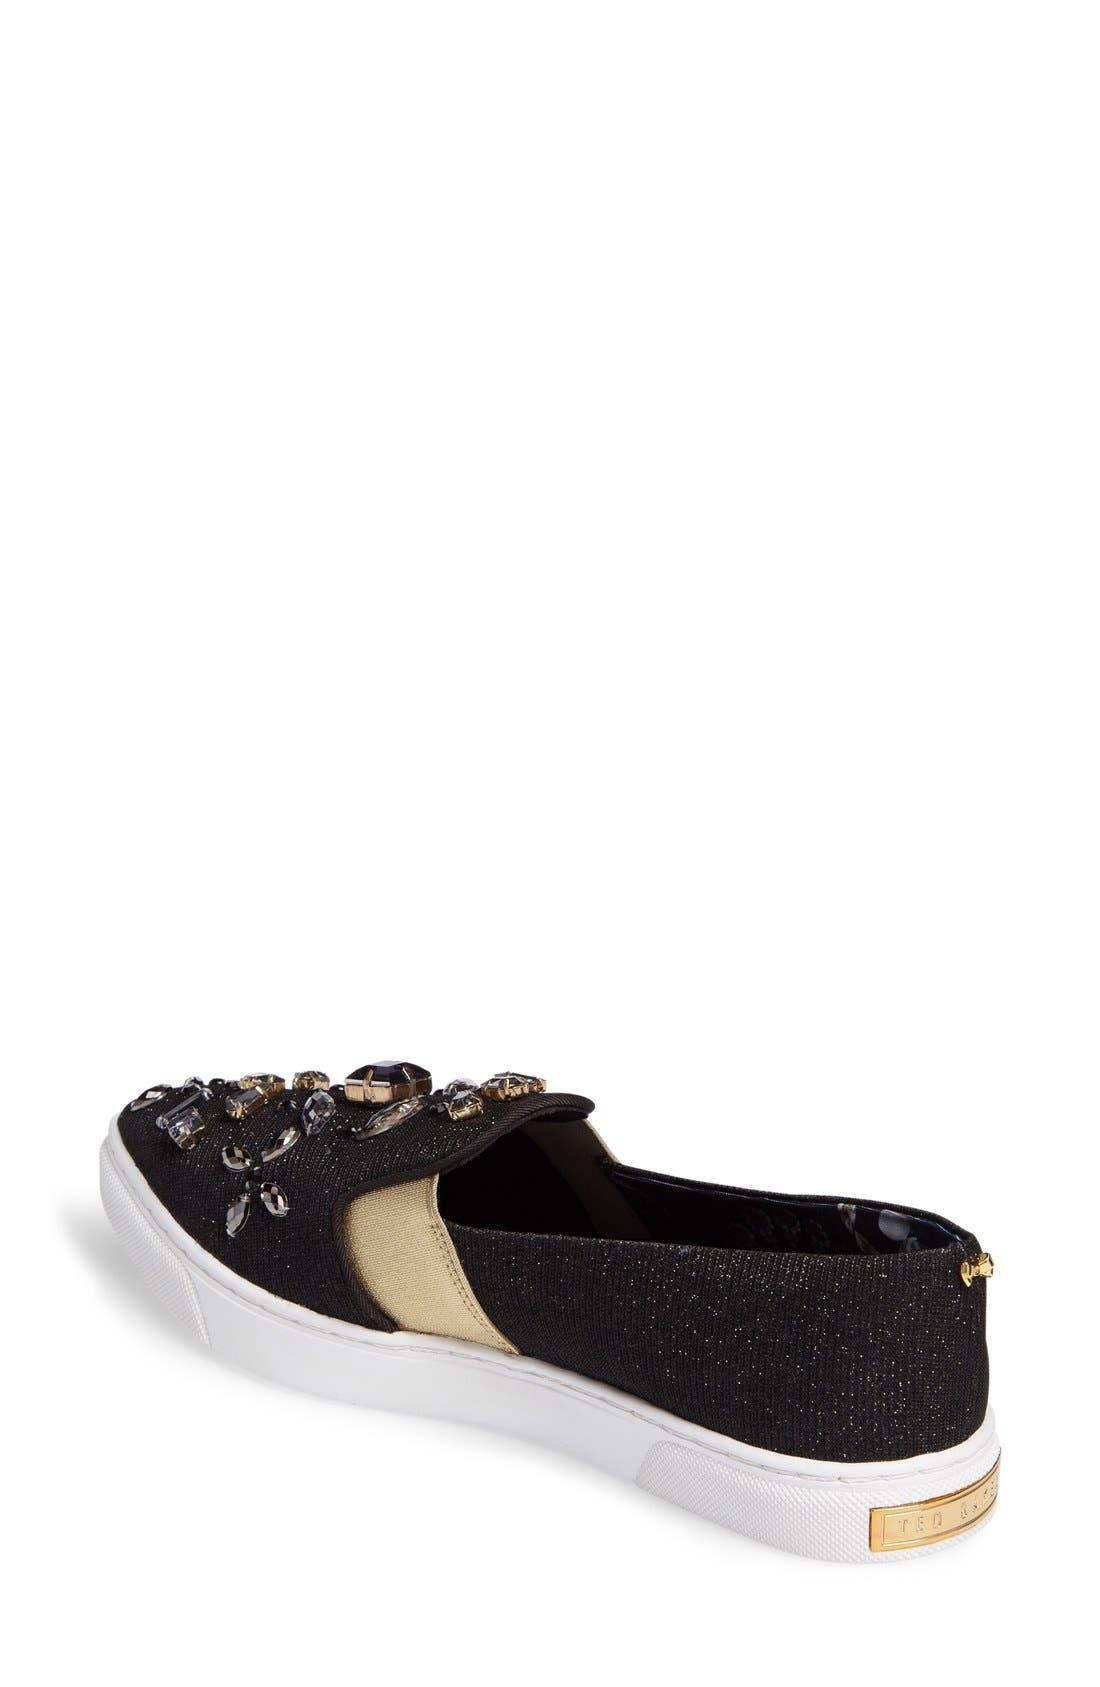 Alternate Image 3  - Ted Baker London 'Thfia' Floral Pointy Toe Slip-On Sneaker (Women)